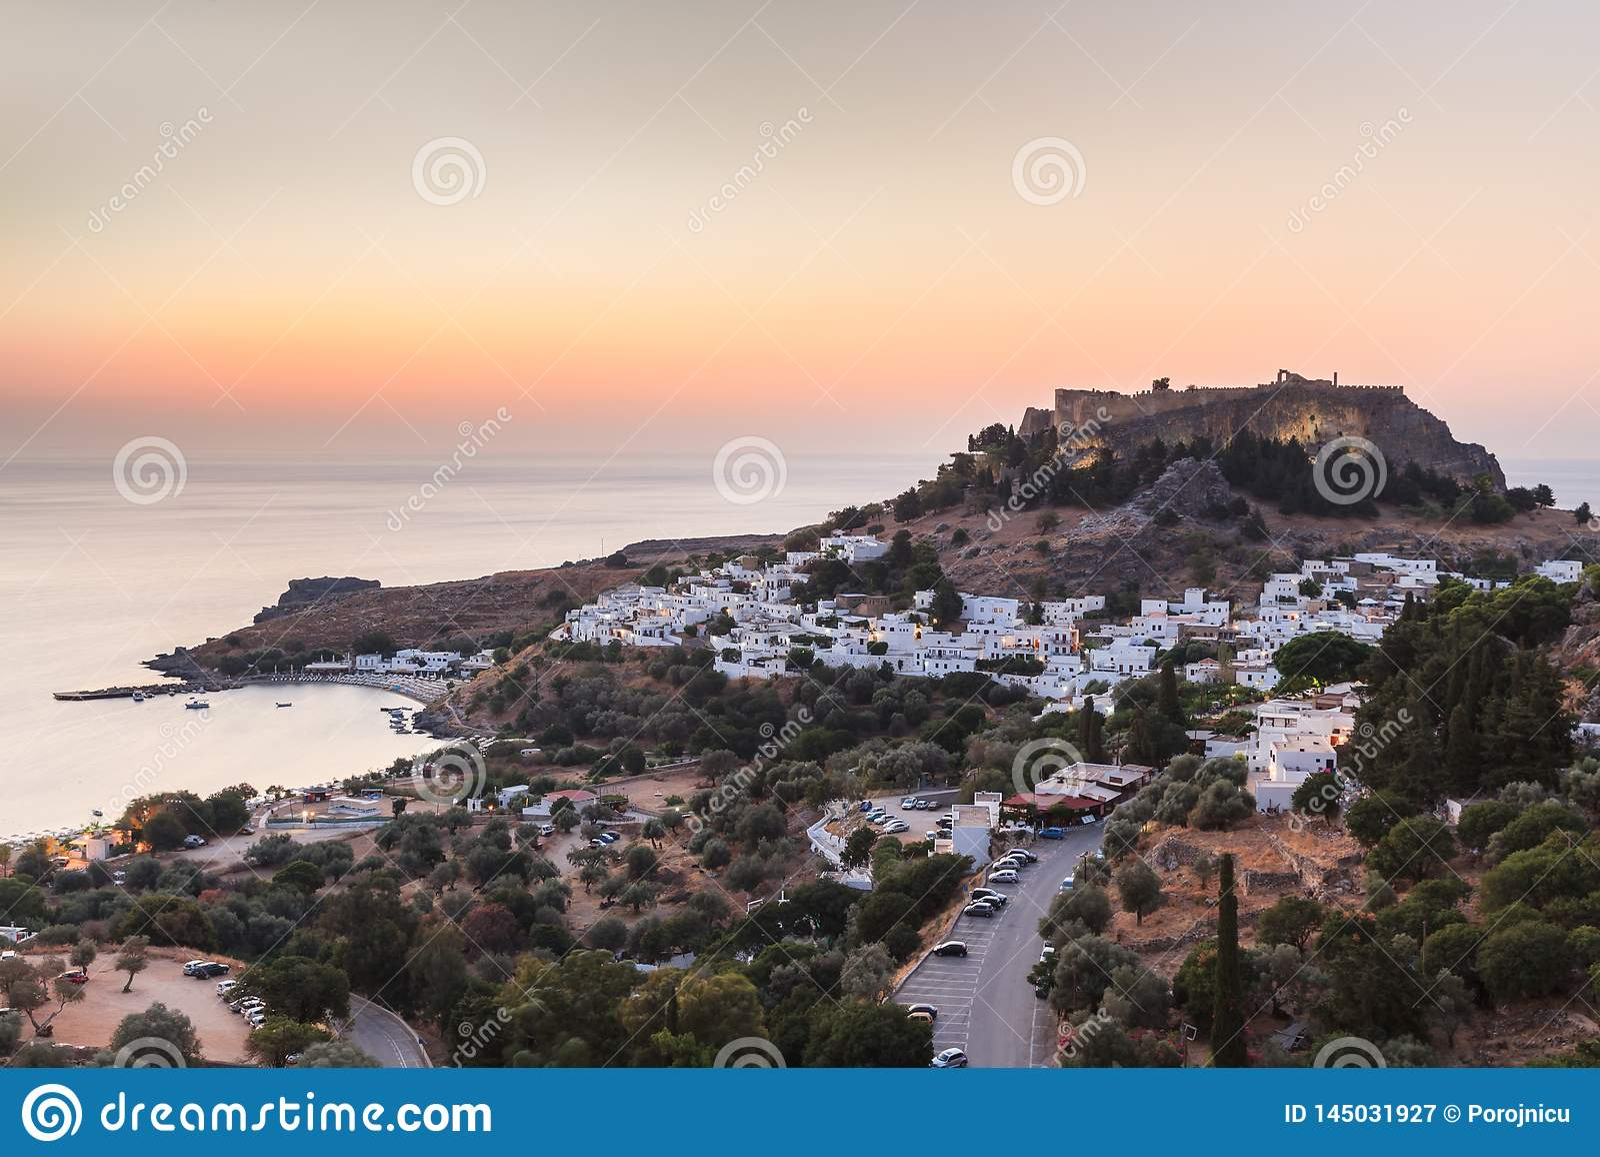 Lindos Castle and village, Greece